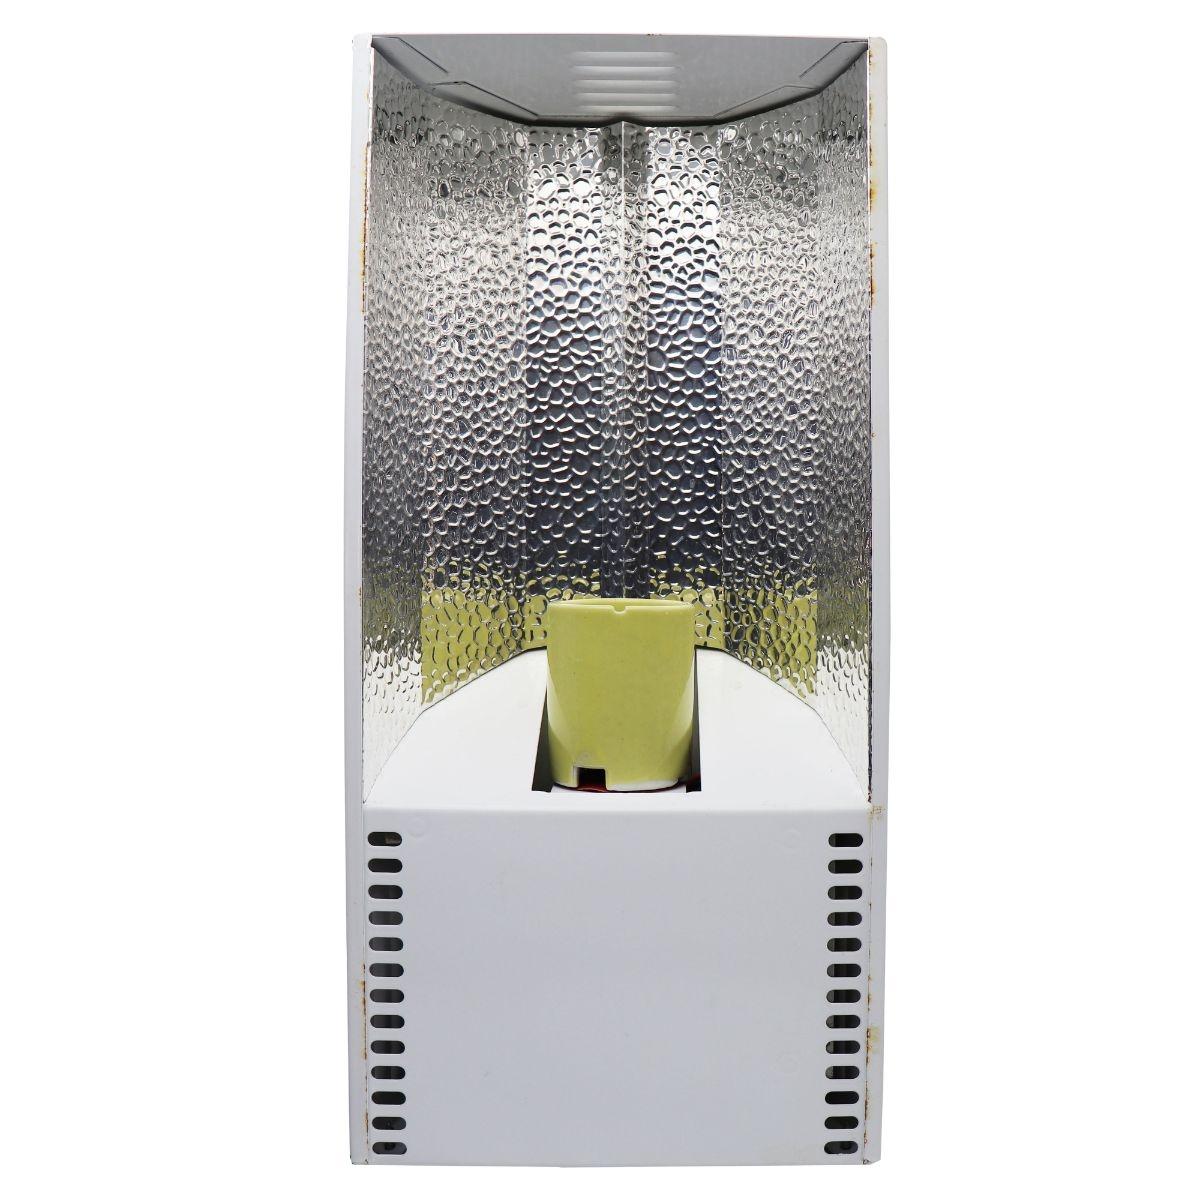 Hydroplanet (SC-P150) 150-Watt Grow Light Fixture - White (NO Bulb)